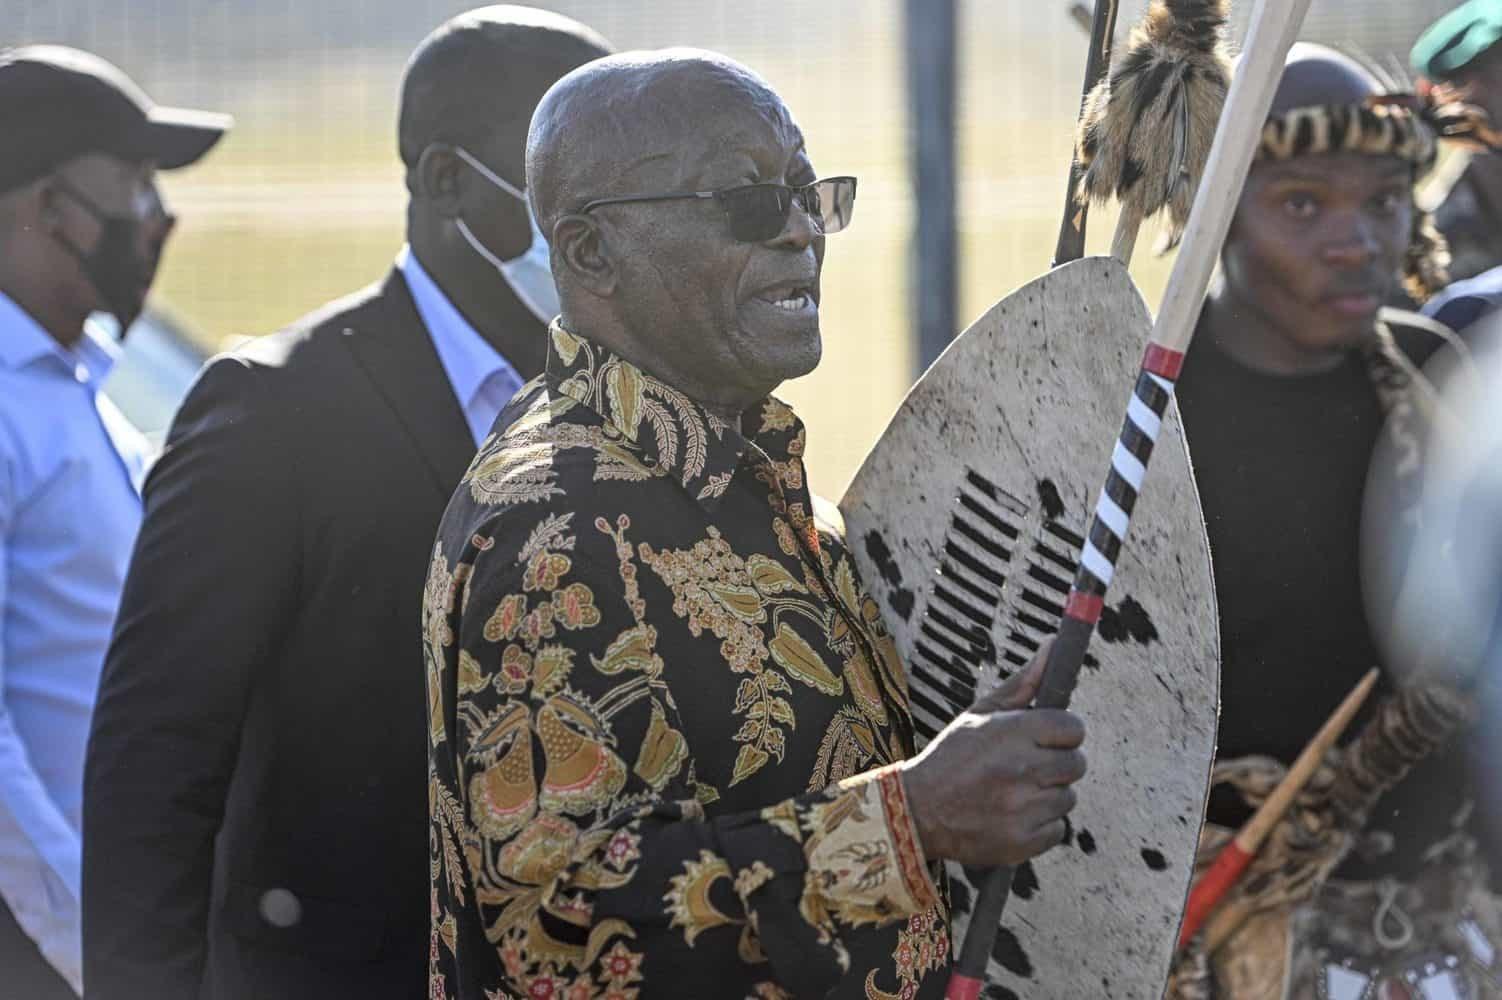 Violence outside Nkandla 'regrettable', 'unfortunate' – Zuma Foundation